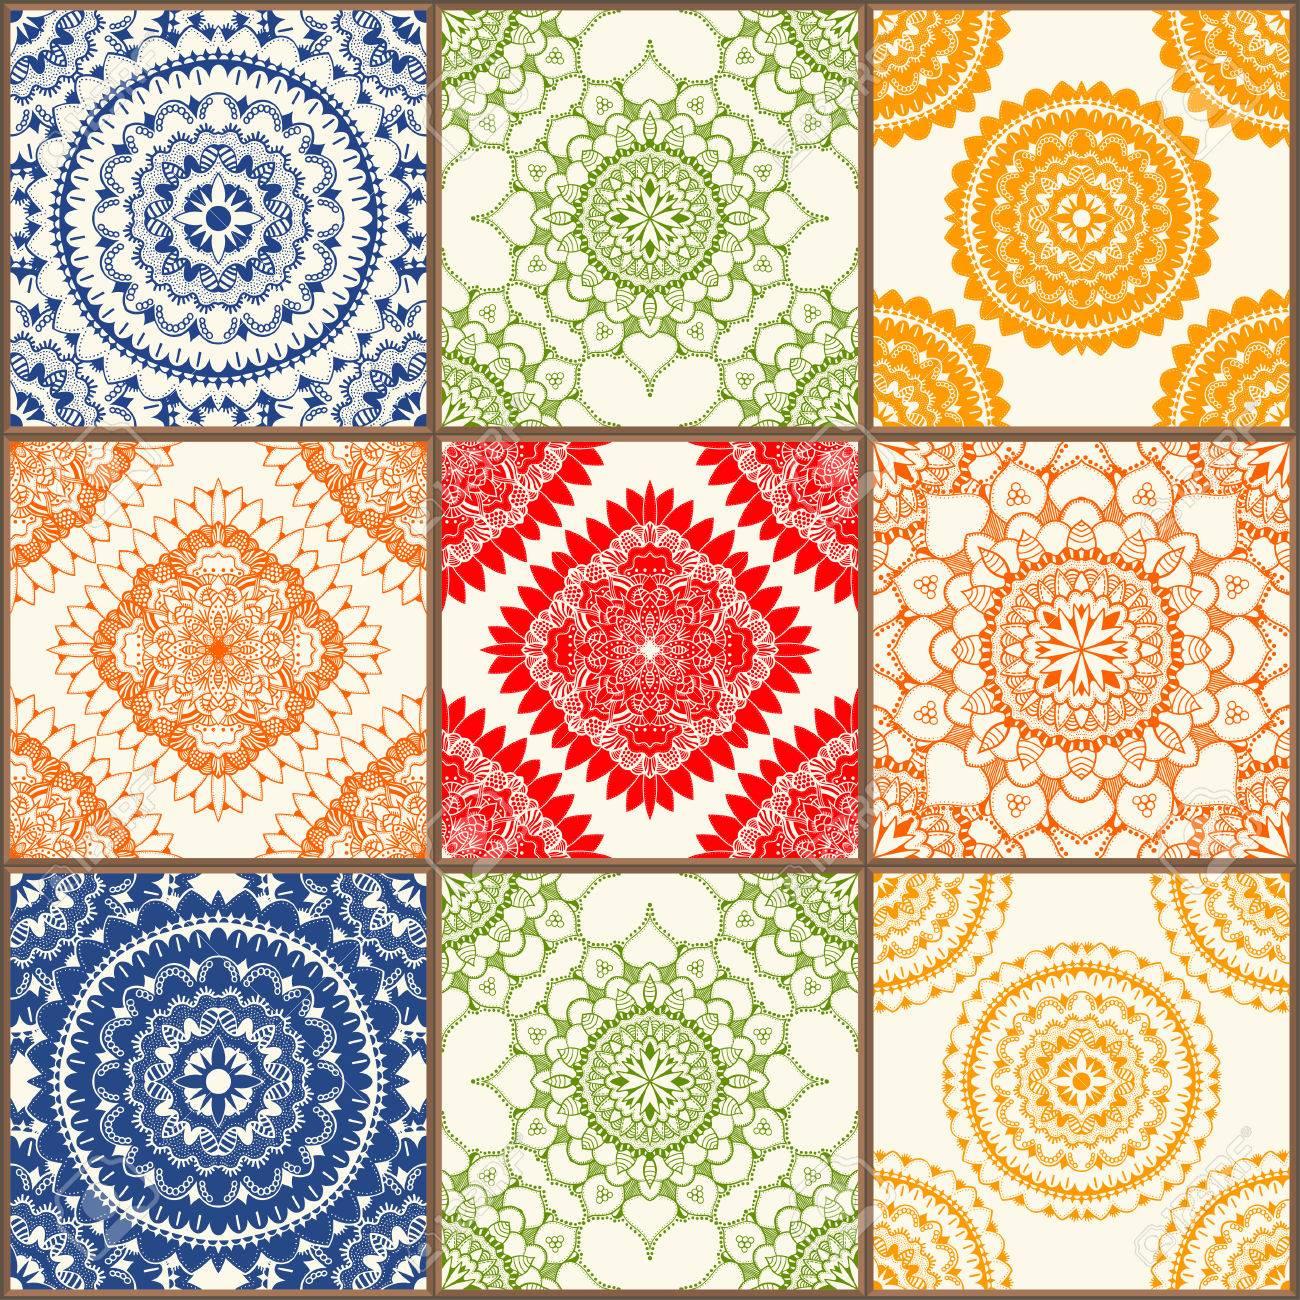 Glazed ceramic tiles set colorful vintage tiles with floral glazed ceramic tiles set colorful vintage tiles with floral and geometrical patterns spanish dailygadgetfo Images